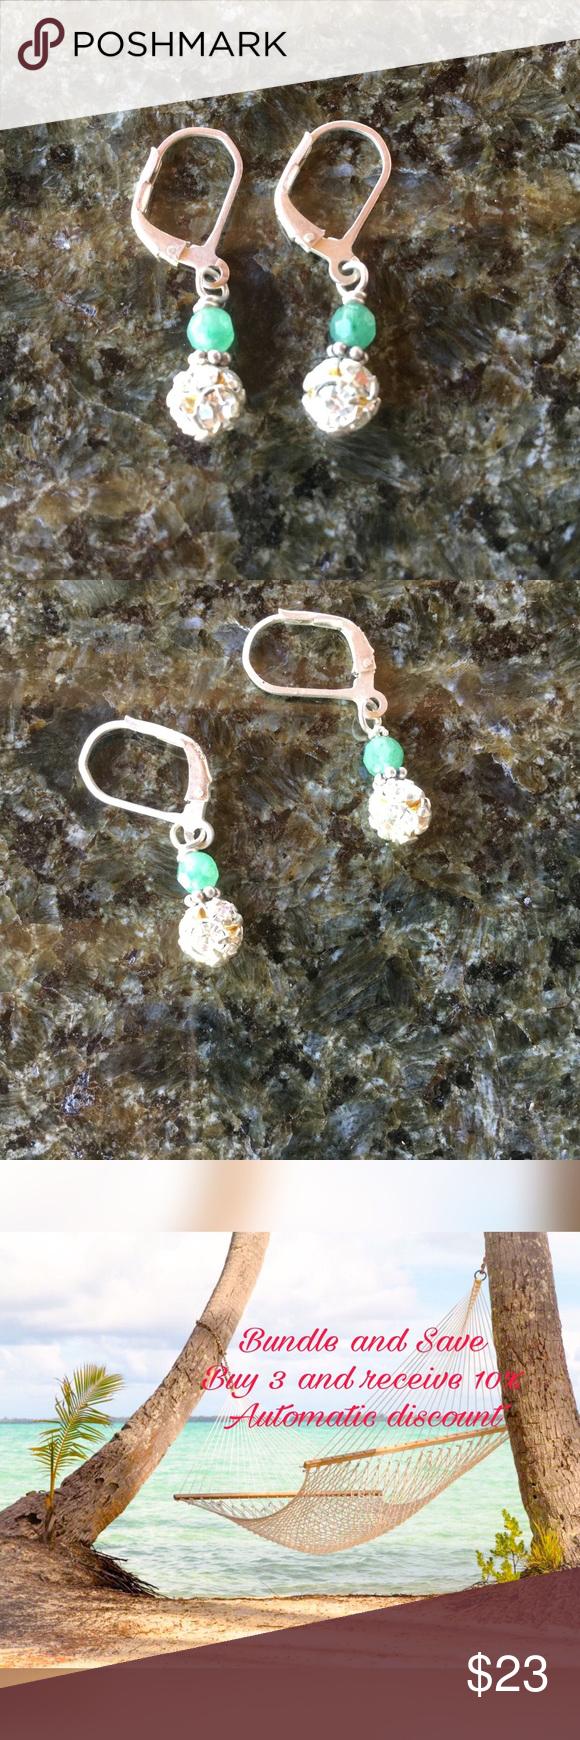 💐Silver Laurie Blann Pierced Earrings Silver pierced earrings with CZs and green beads. Made in Jackson Wyoming.  Like new. Laurie Blann Jewelry Earrings